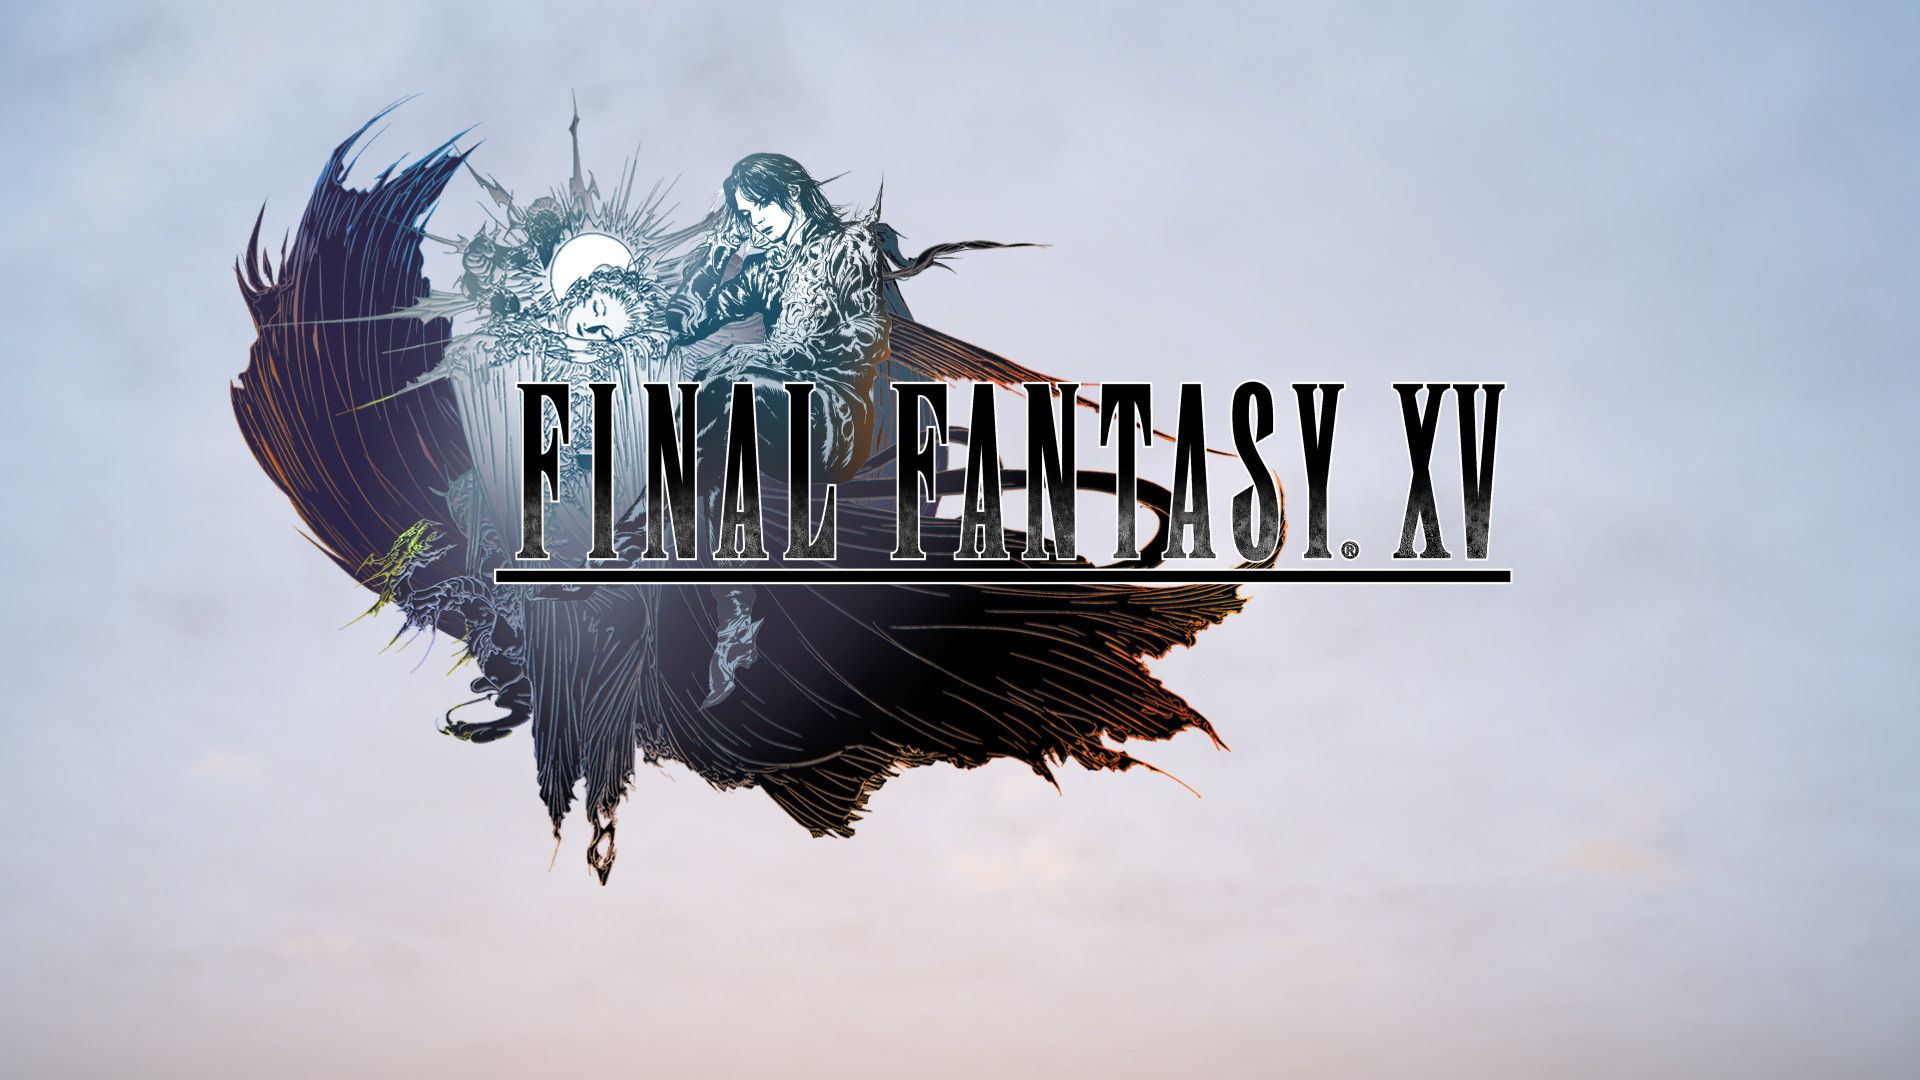 FF XV[spoiler] A wallpaper for Final Fantasy XV …